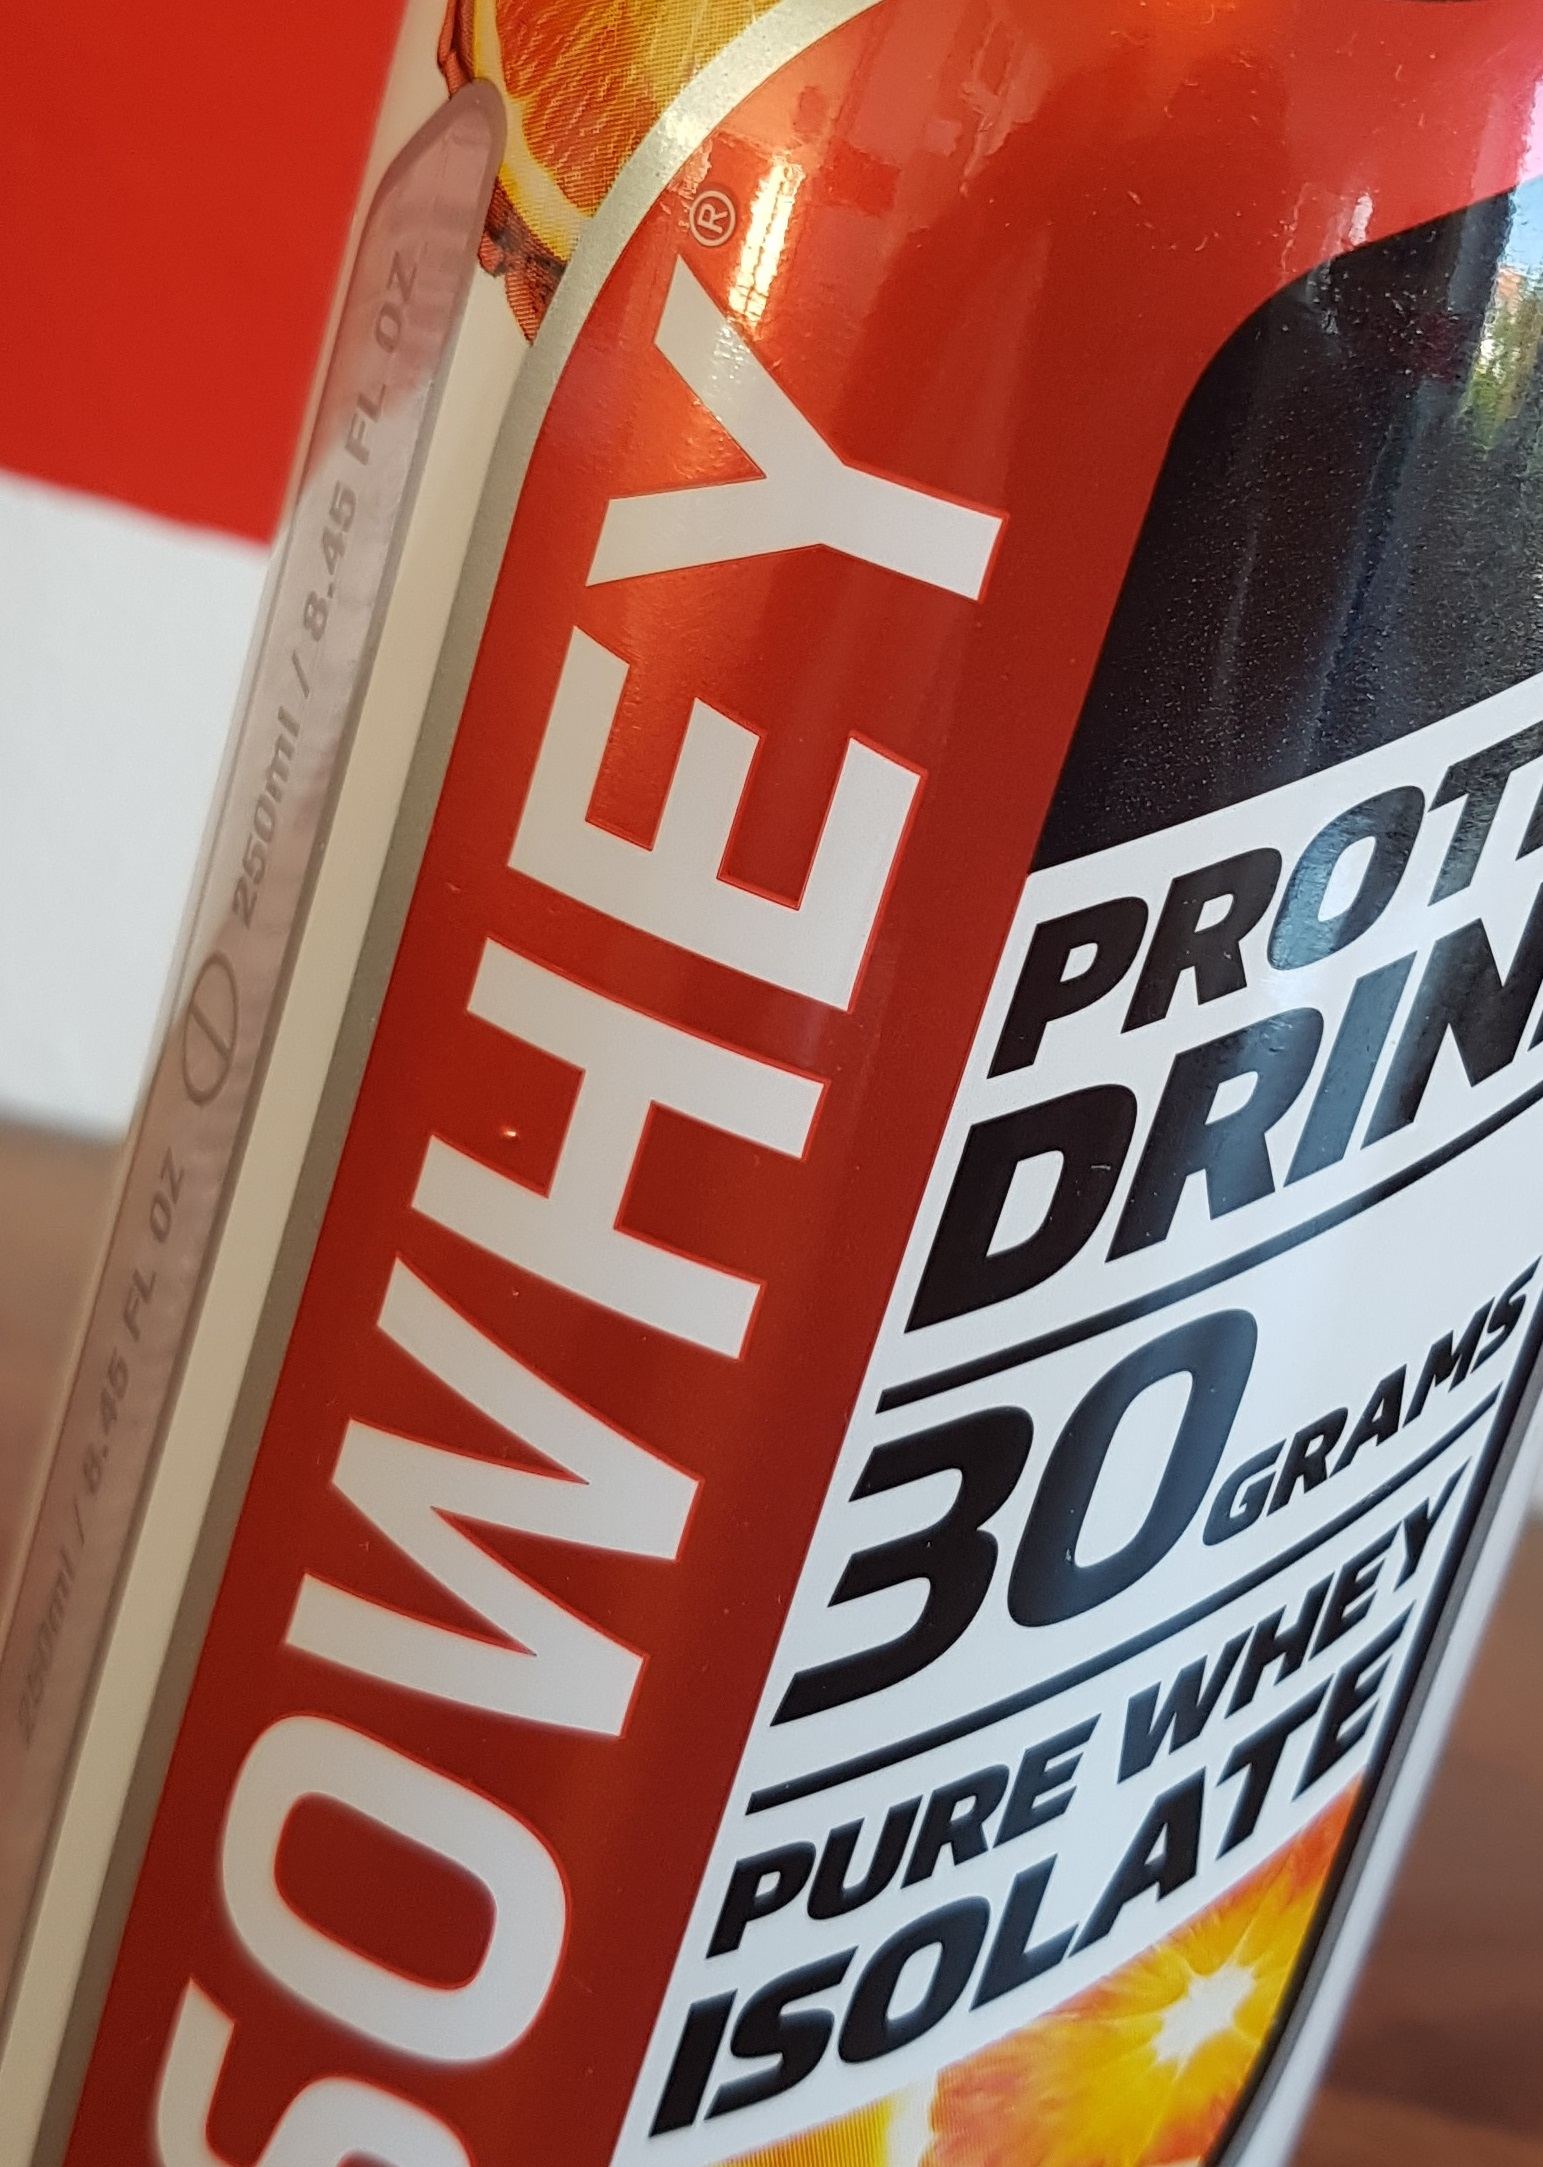 1 Kiste Iso Whey (500 ml Flasche) - 16 Stück